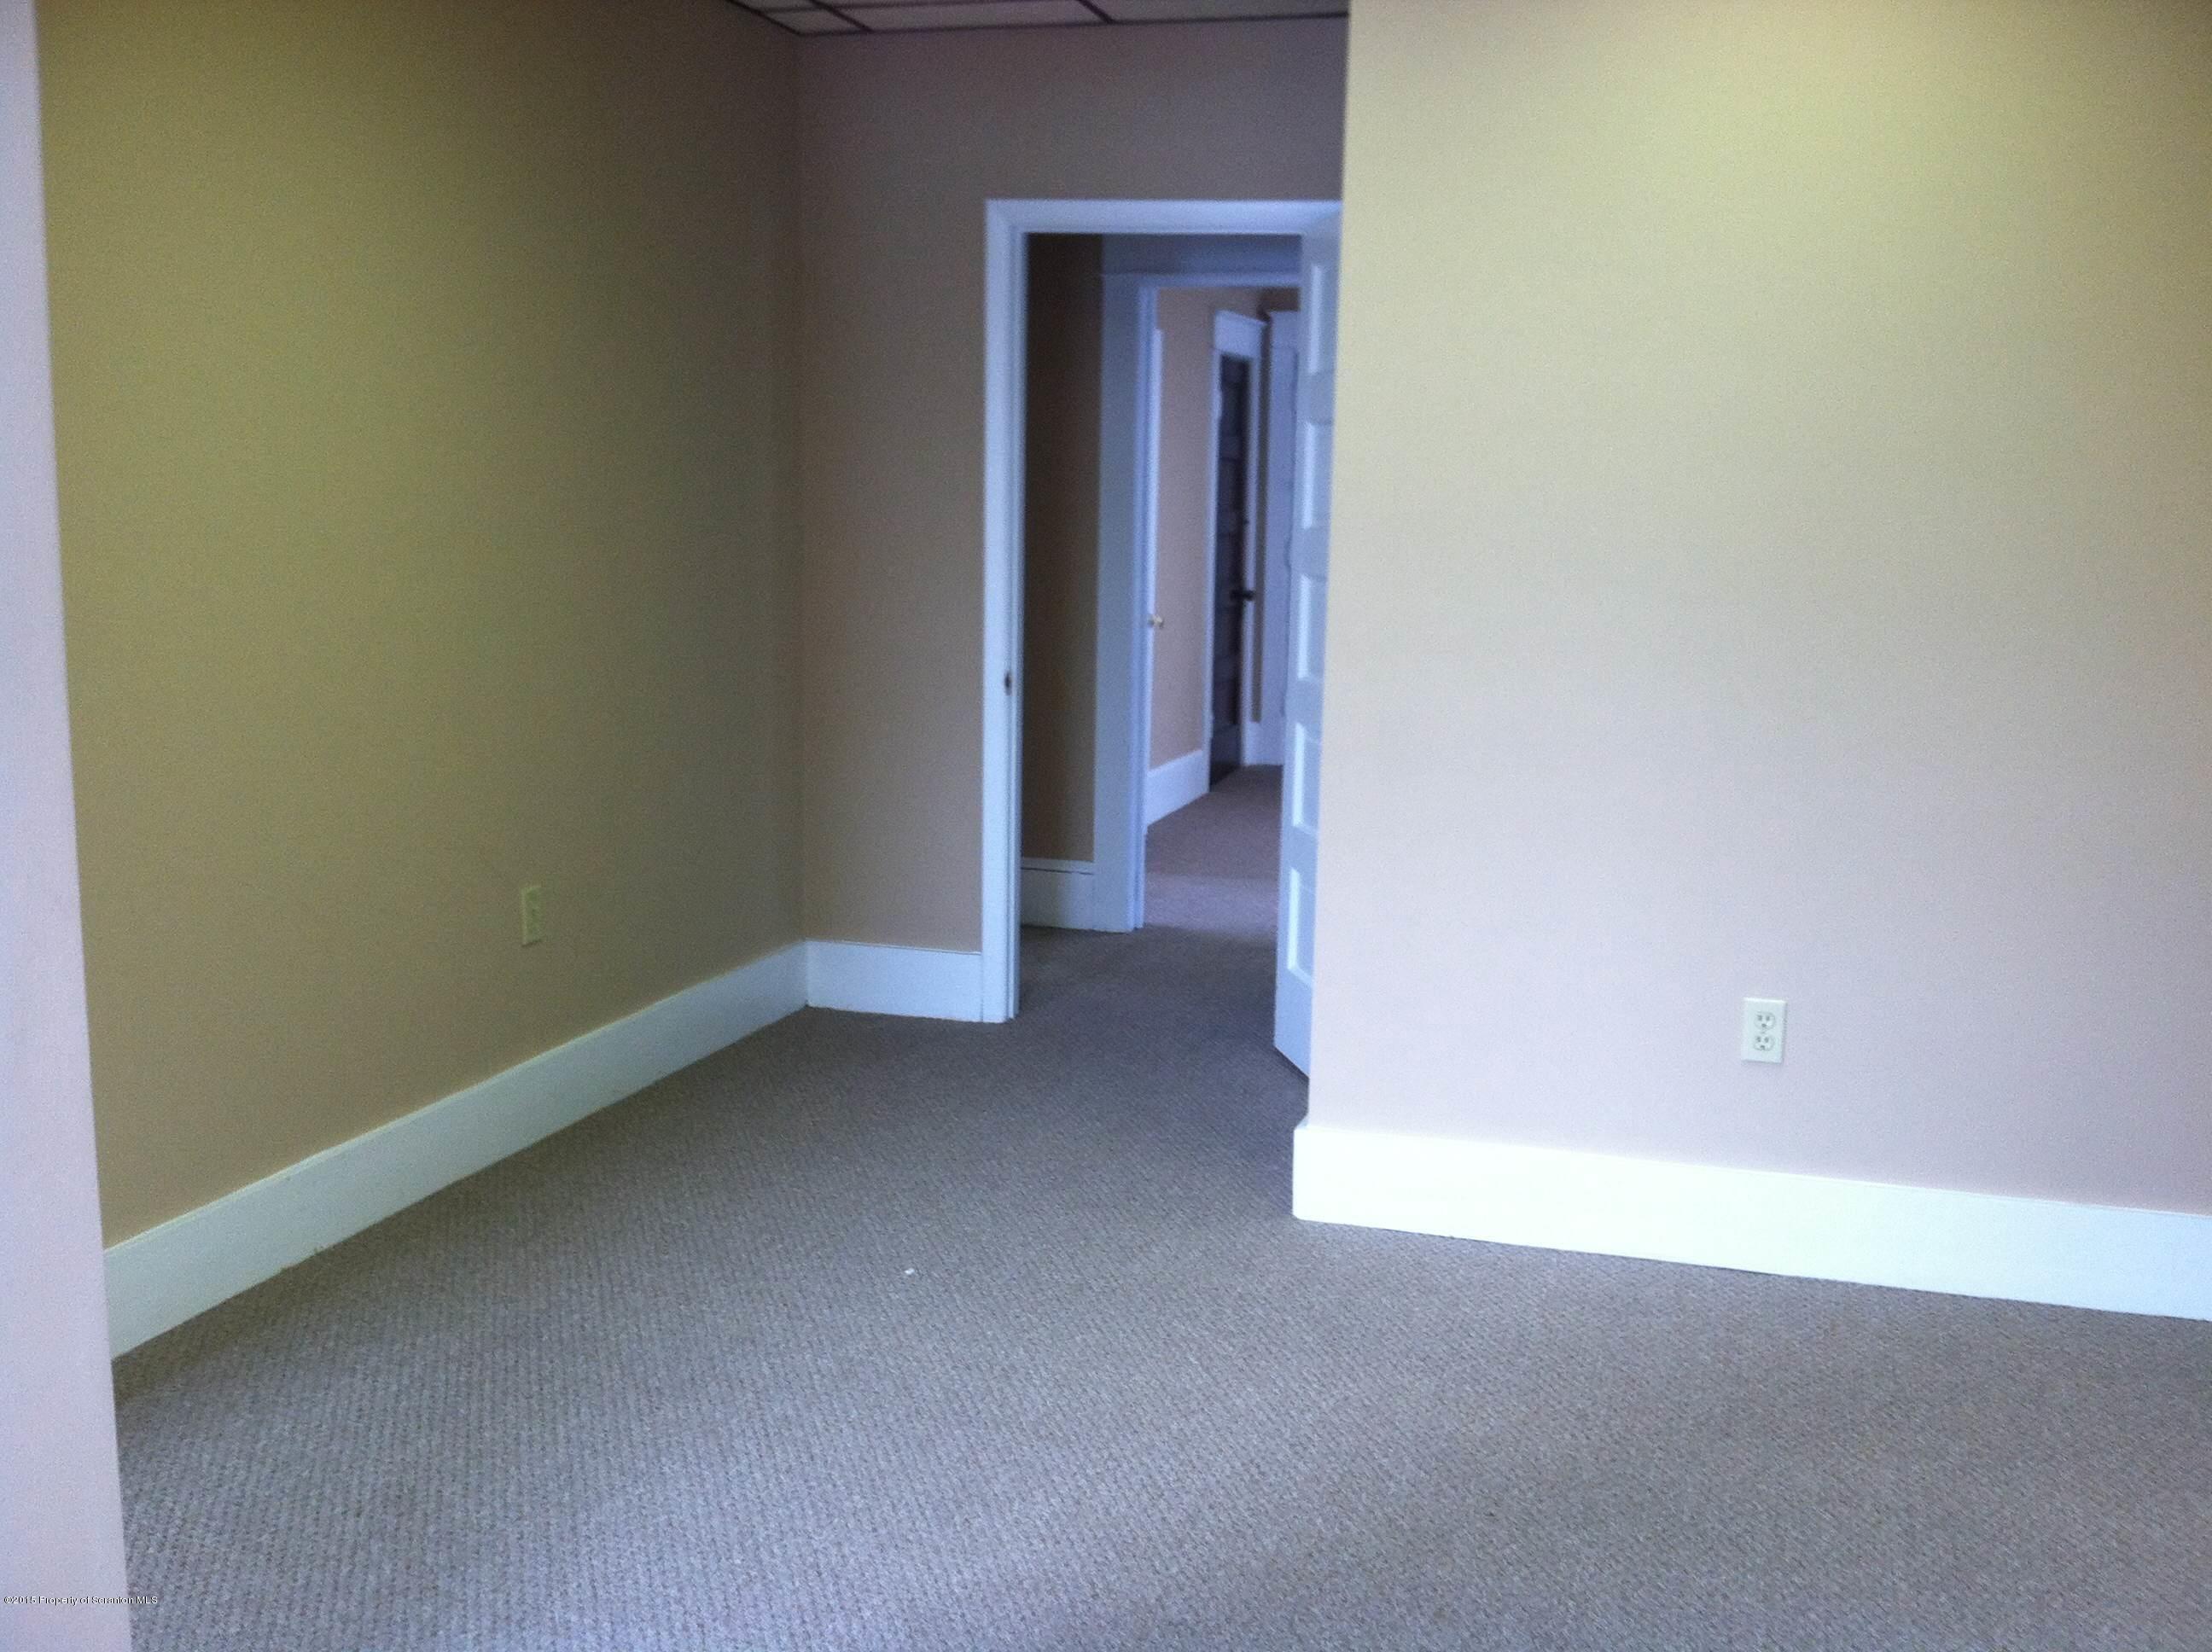 826 Main St, Peckville, Pennsylvania 18452, ,2 BathroomsBathrooms,Commercial,For Lease,Main,15-107